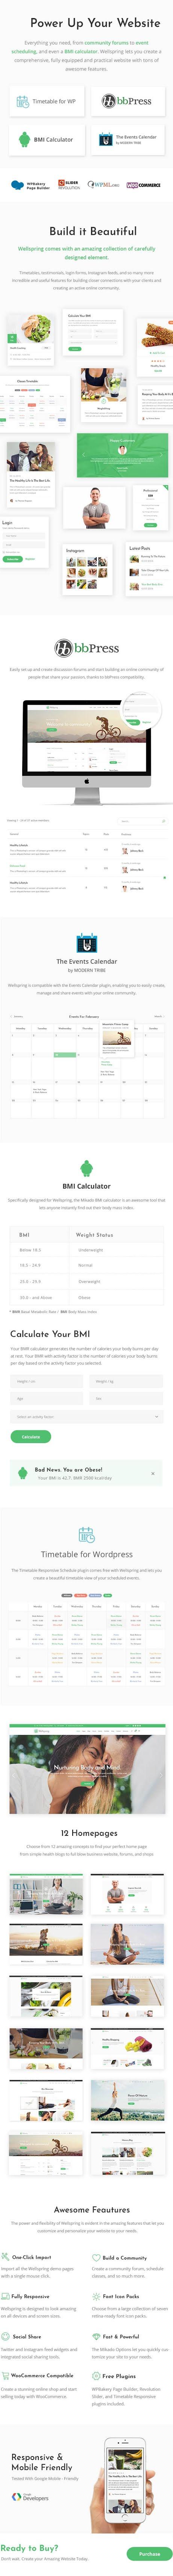 WordPress Theme for Health, Lifestyle & Wellness  - Wellspring